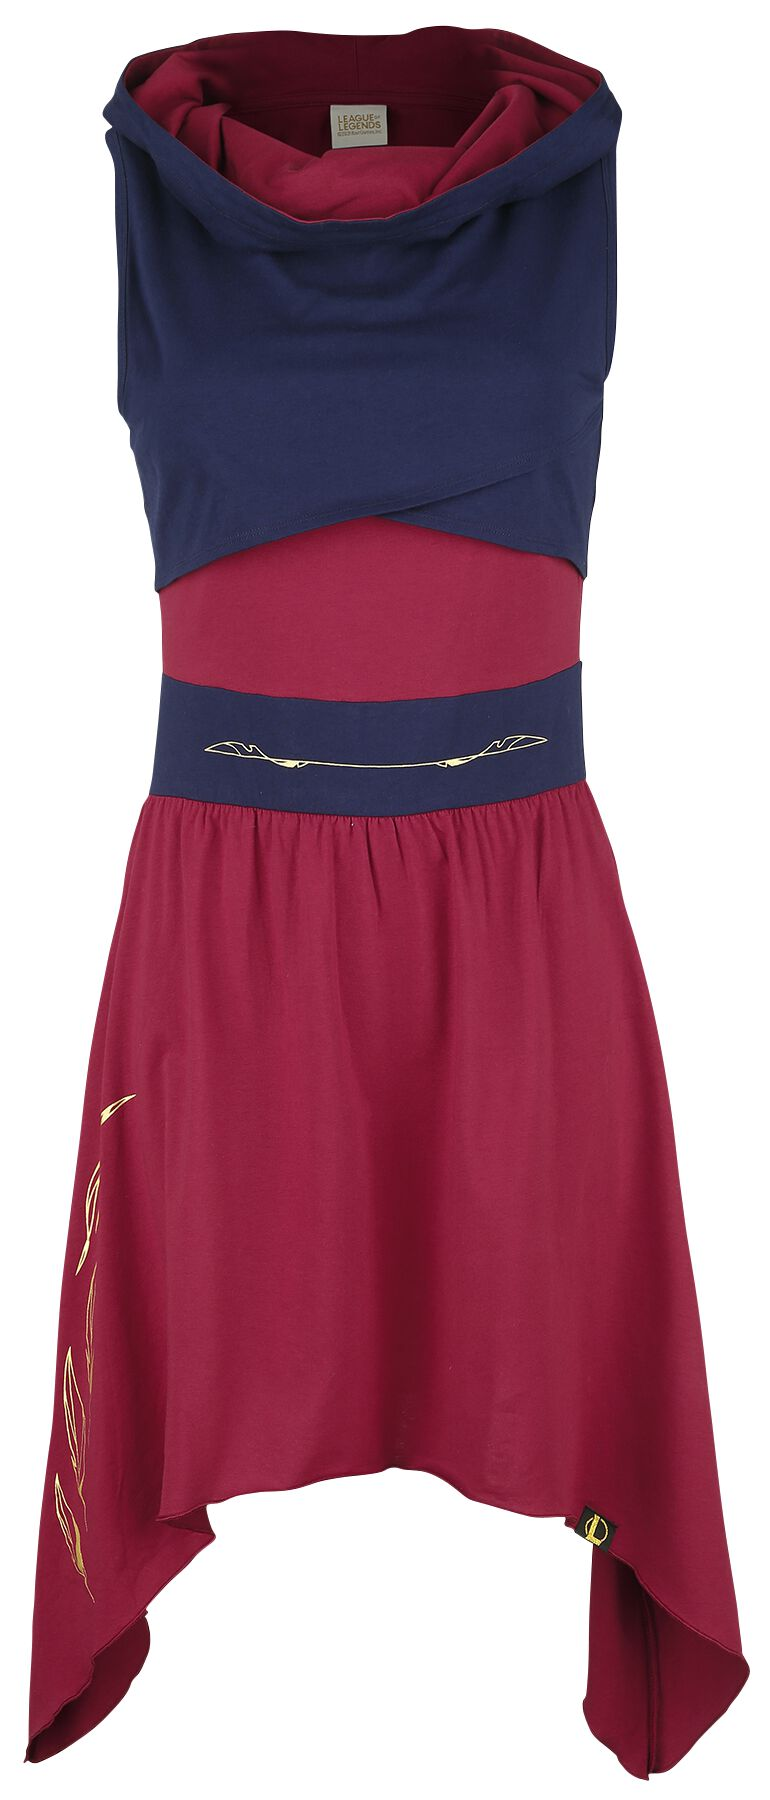 League Of Legends Xayah Mittellanges Kleid rot blau M430250